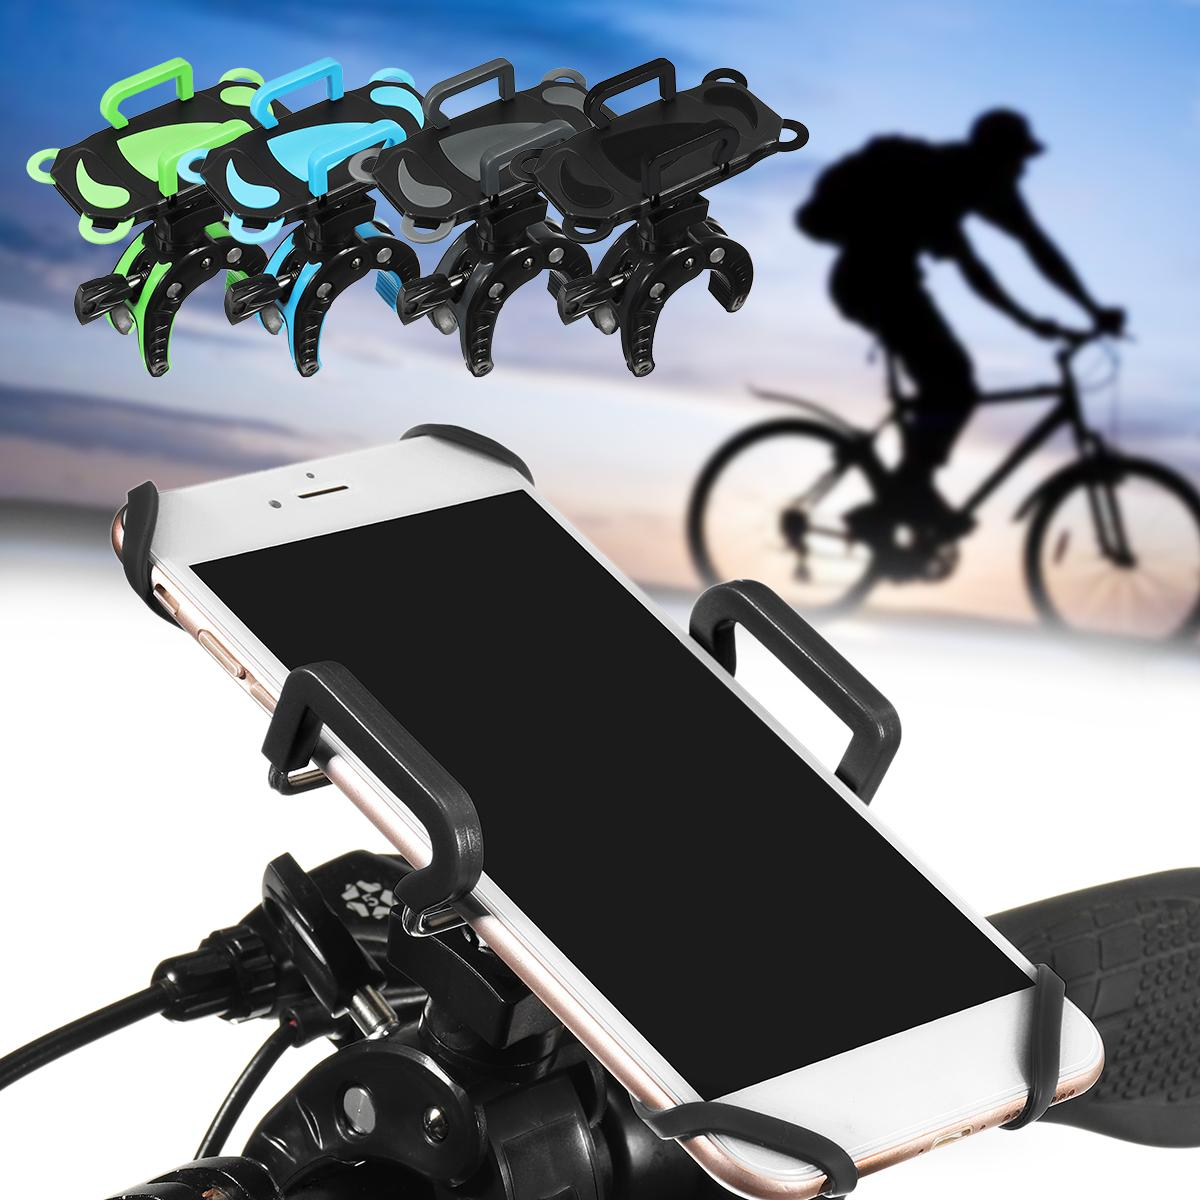 Bike MTB Bicycle Motorcycle Handlebar Mount Baby Car Stroller Holder For Mobile